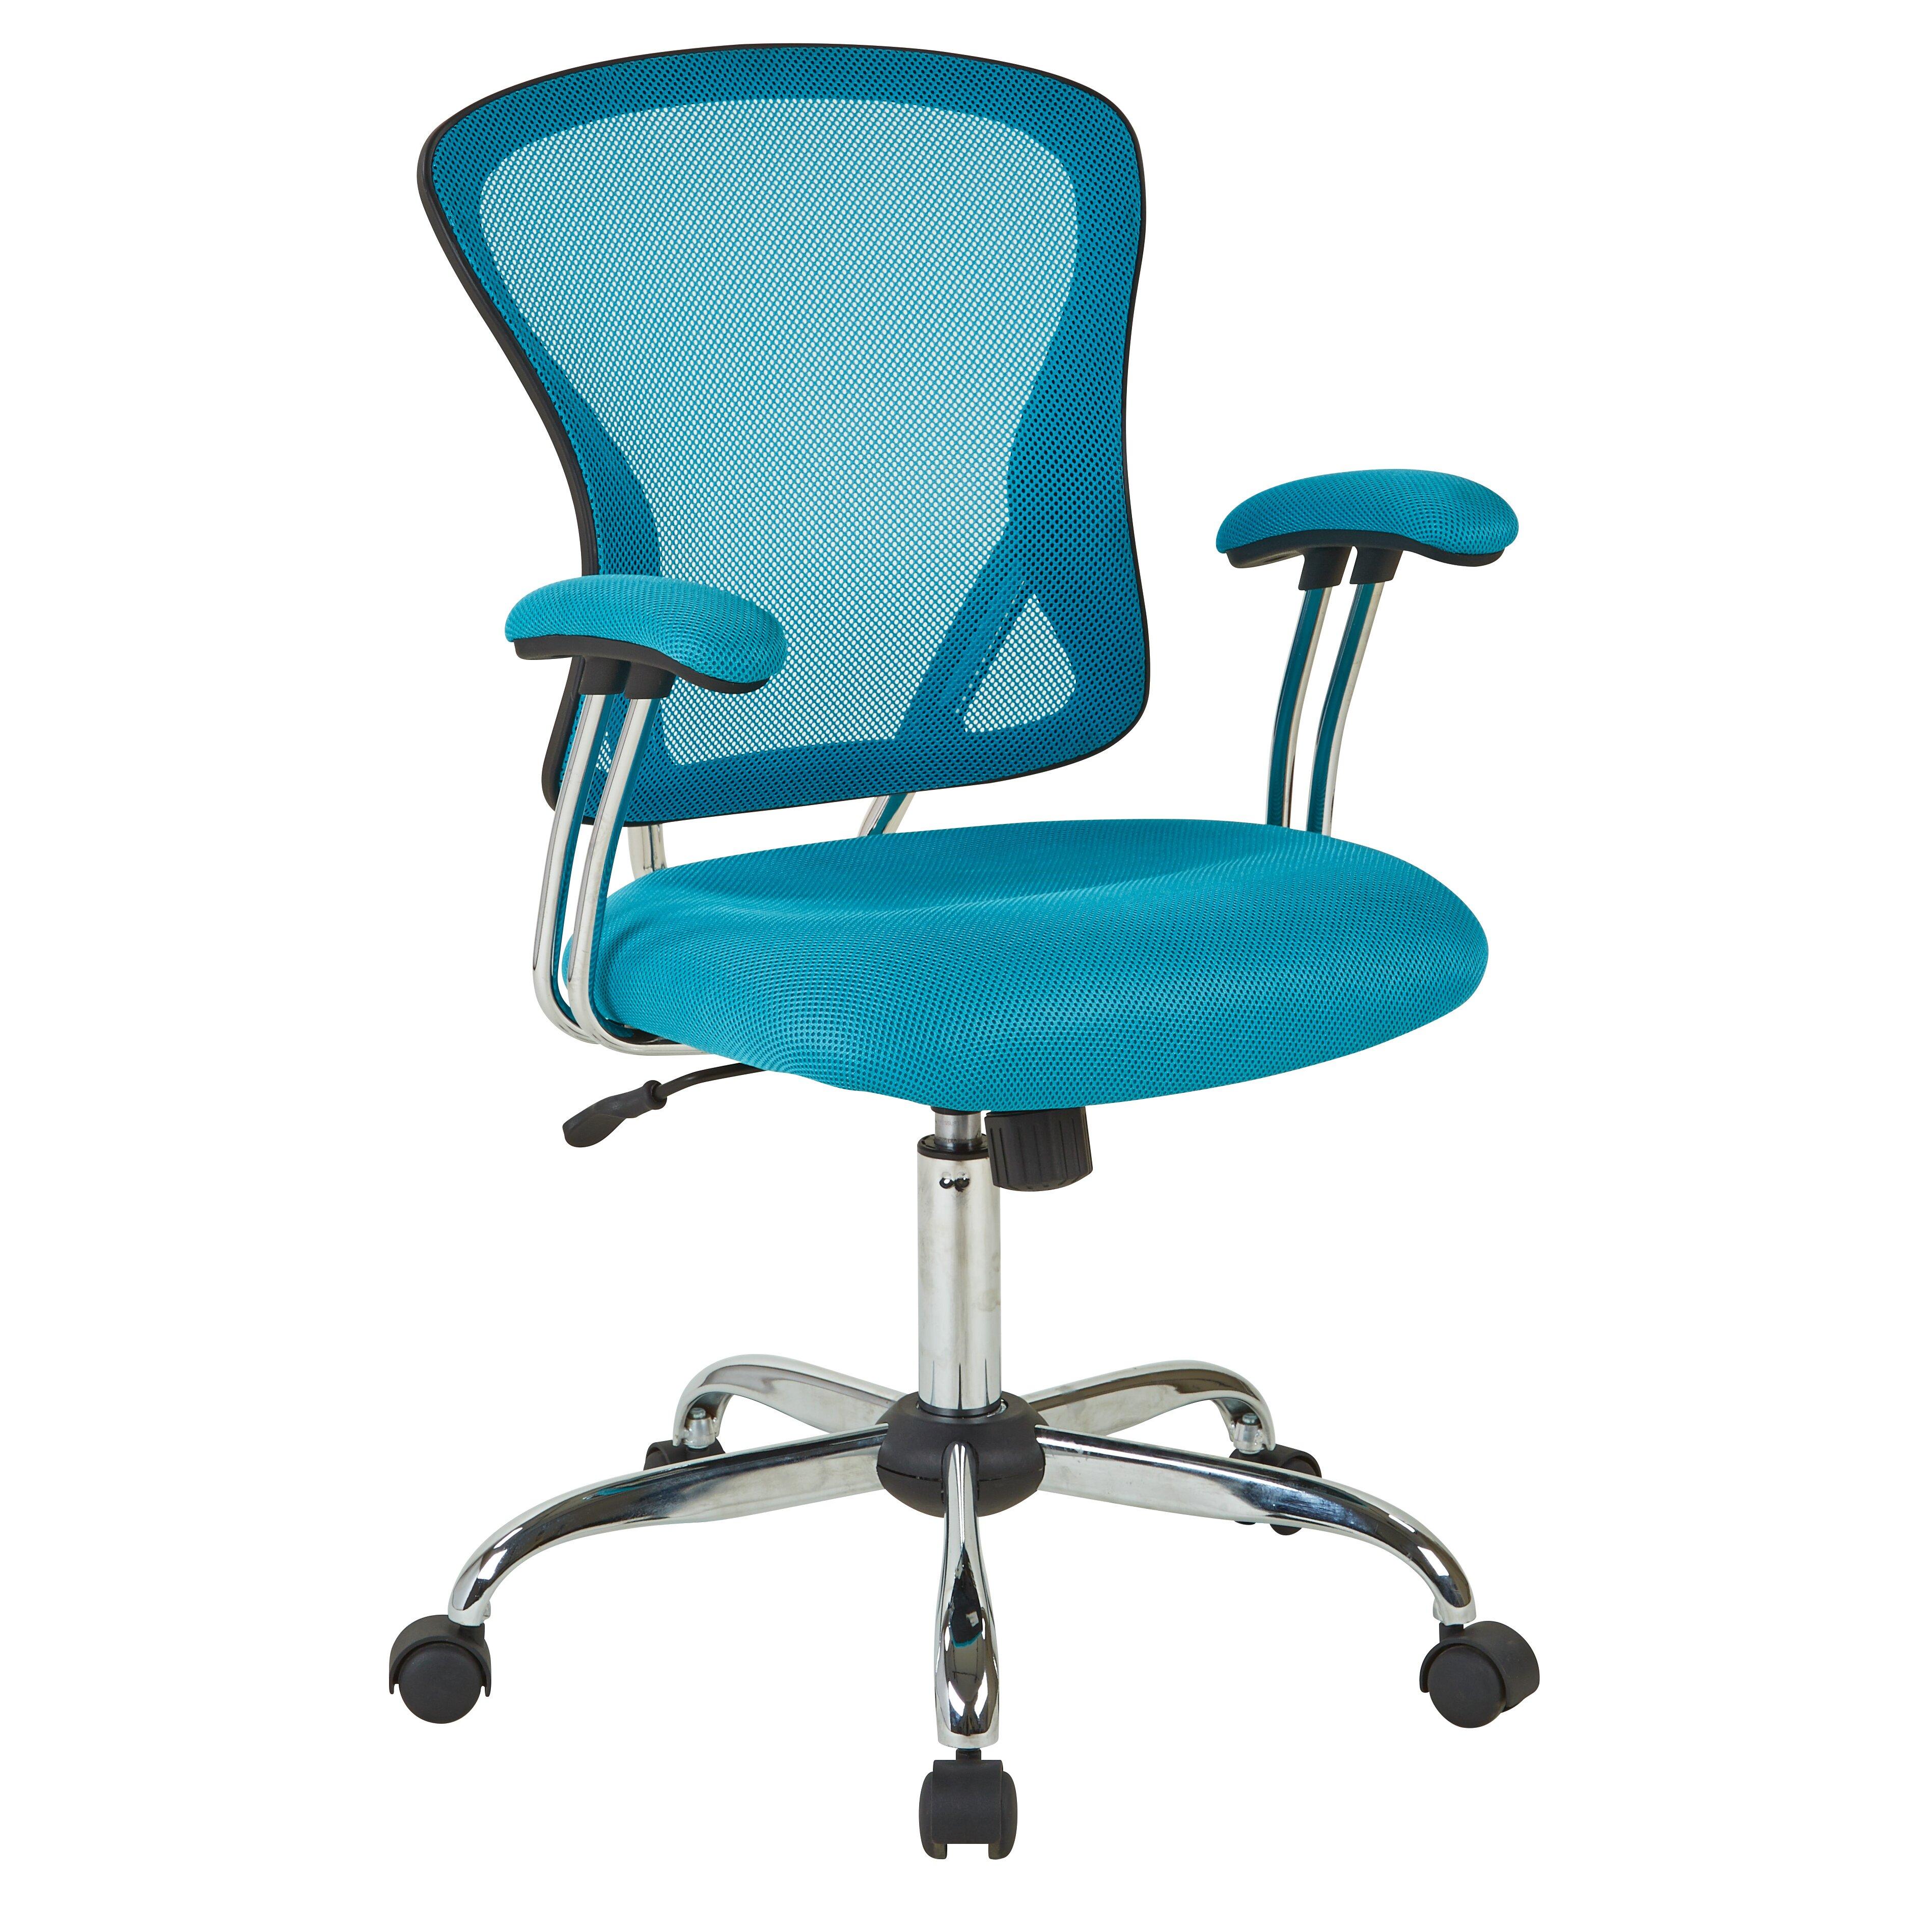 Desk Chair Back PU Leather Ergonomic High Back Executive Best Desk